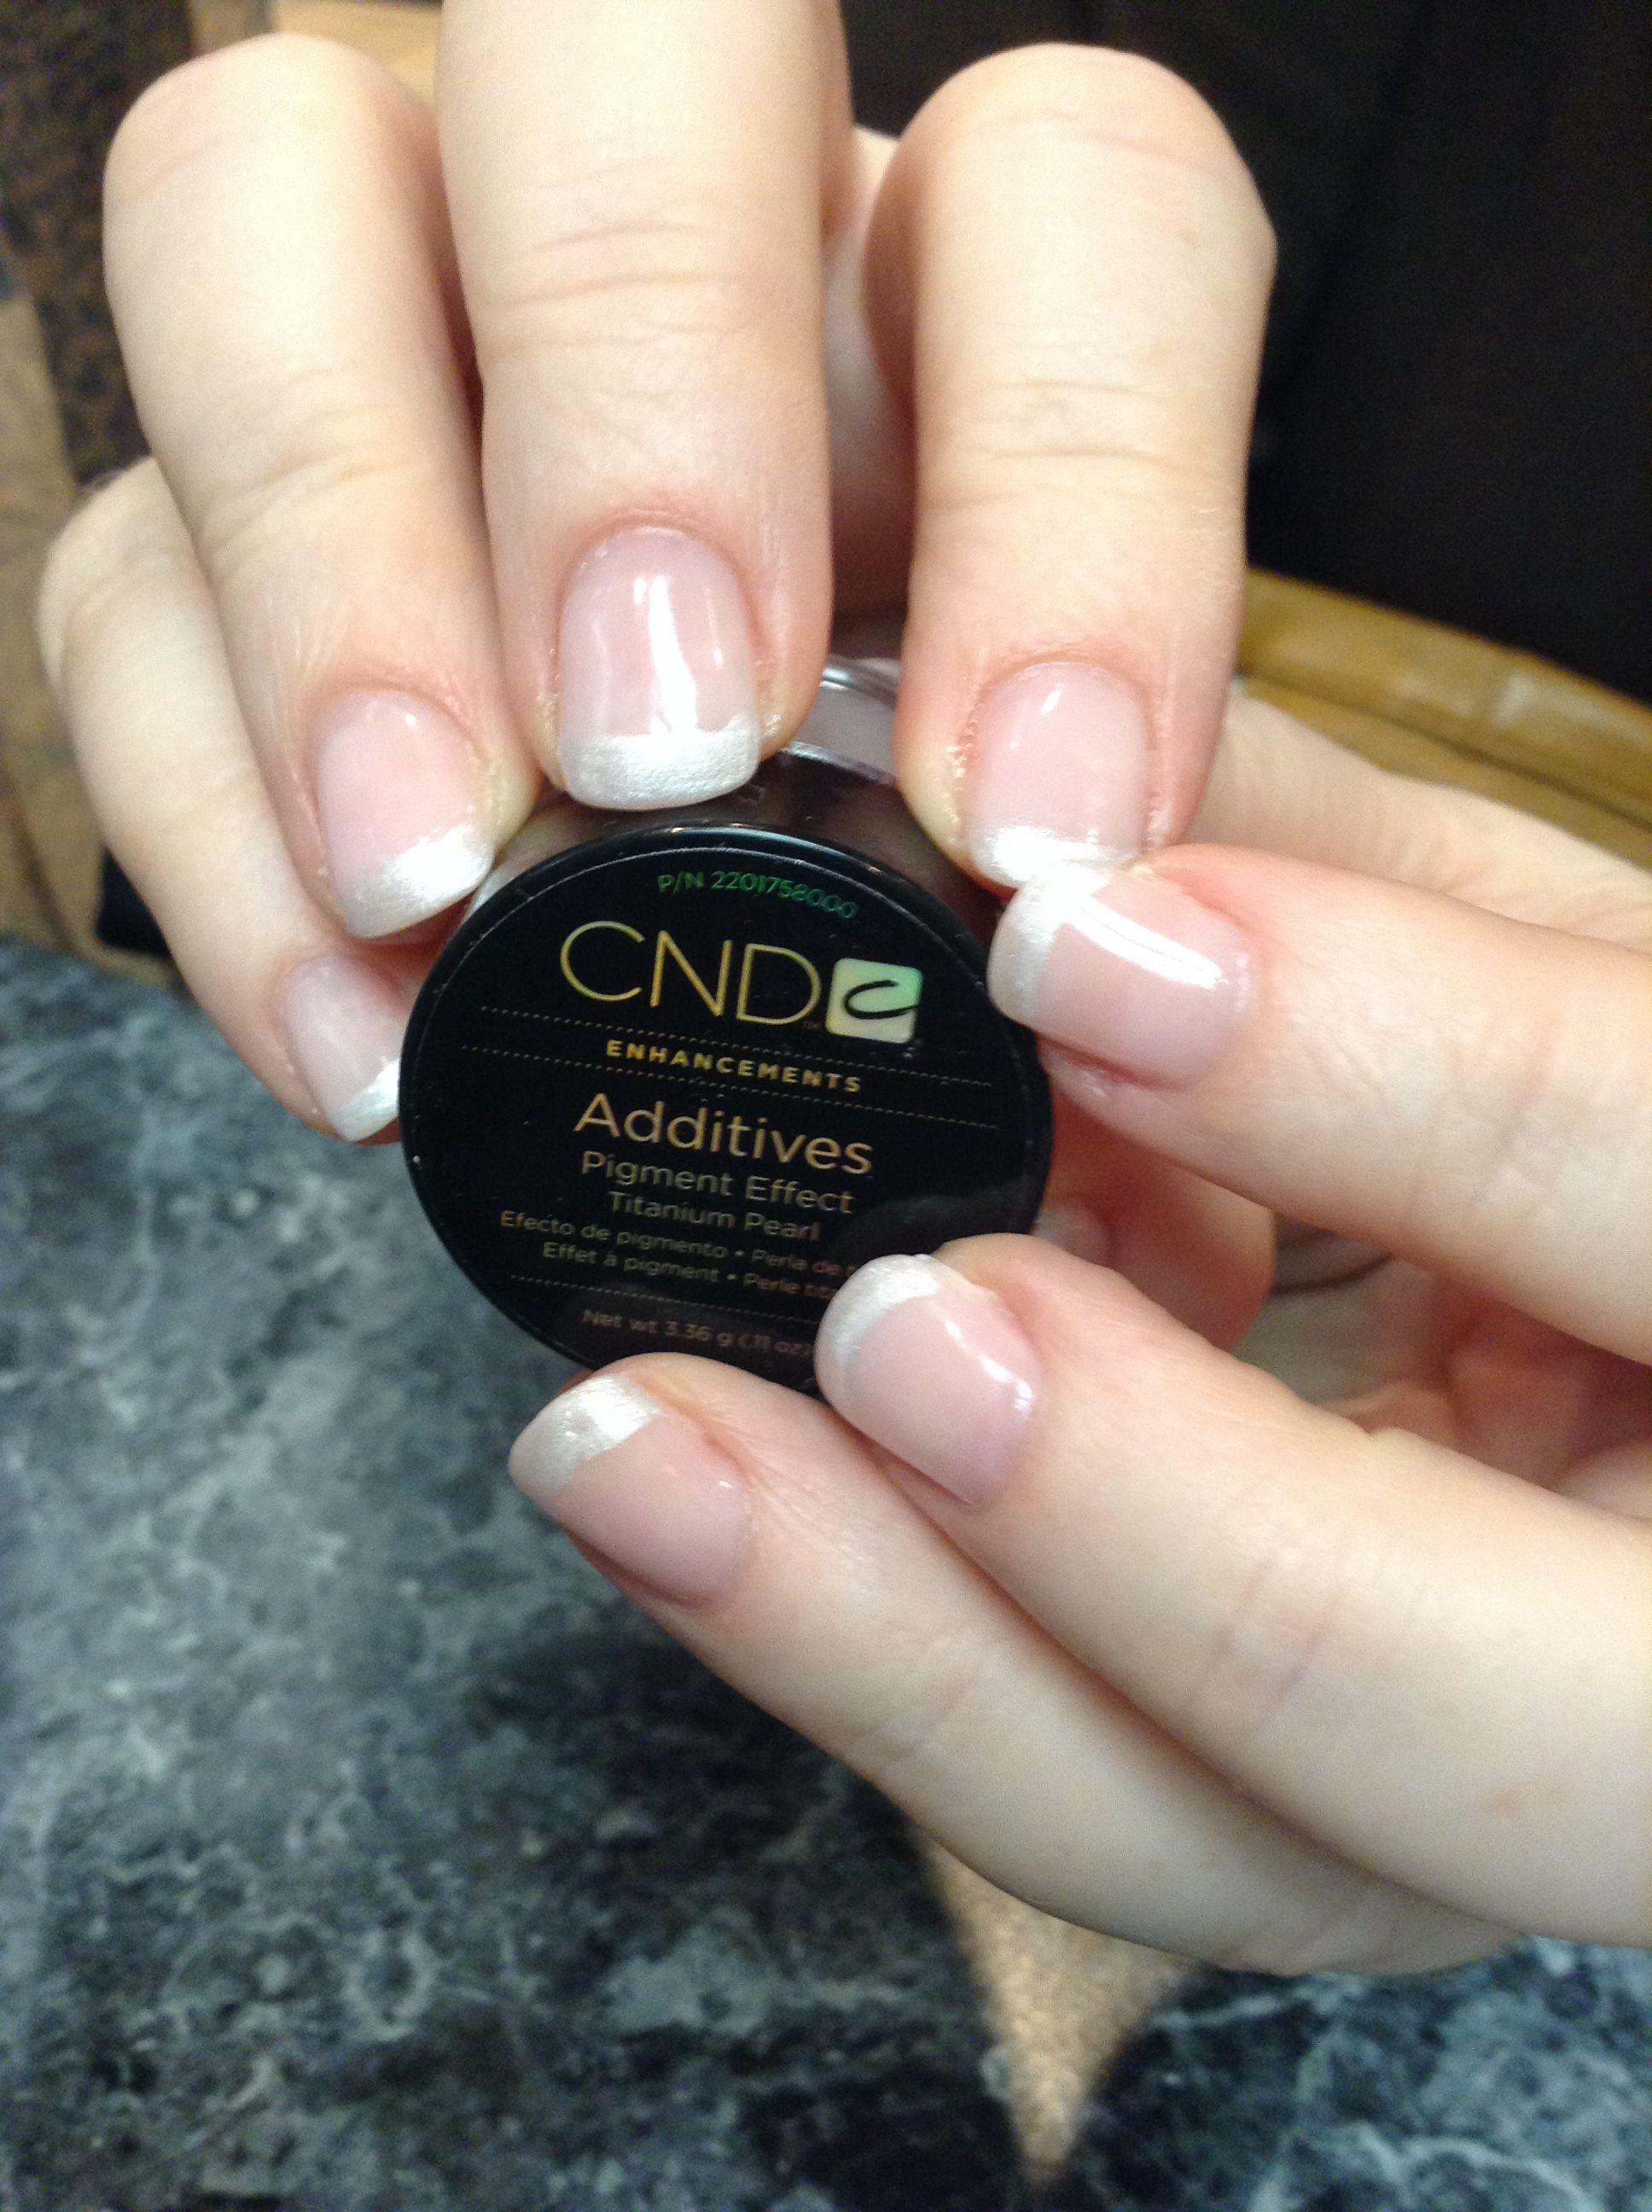 CND BRISA LITE SCULPTING GEL NAILS w Additives Titanium Pearl tips ...